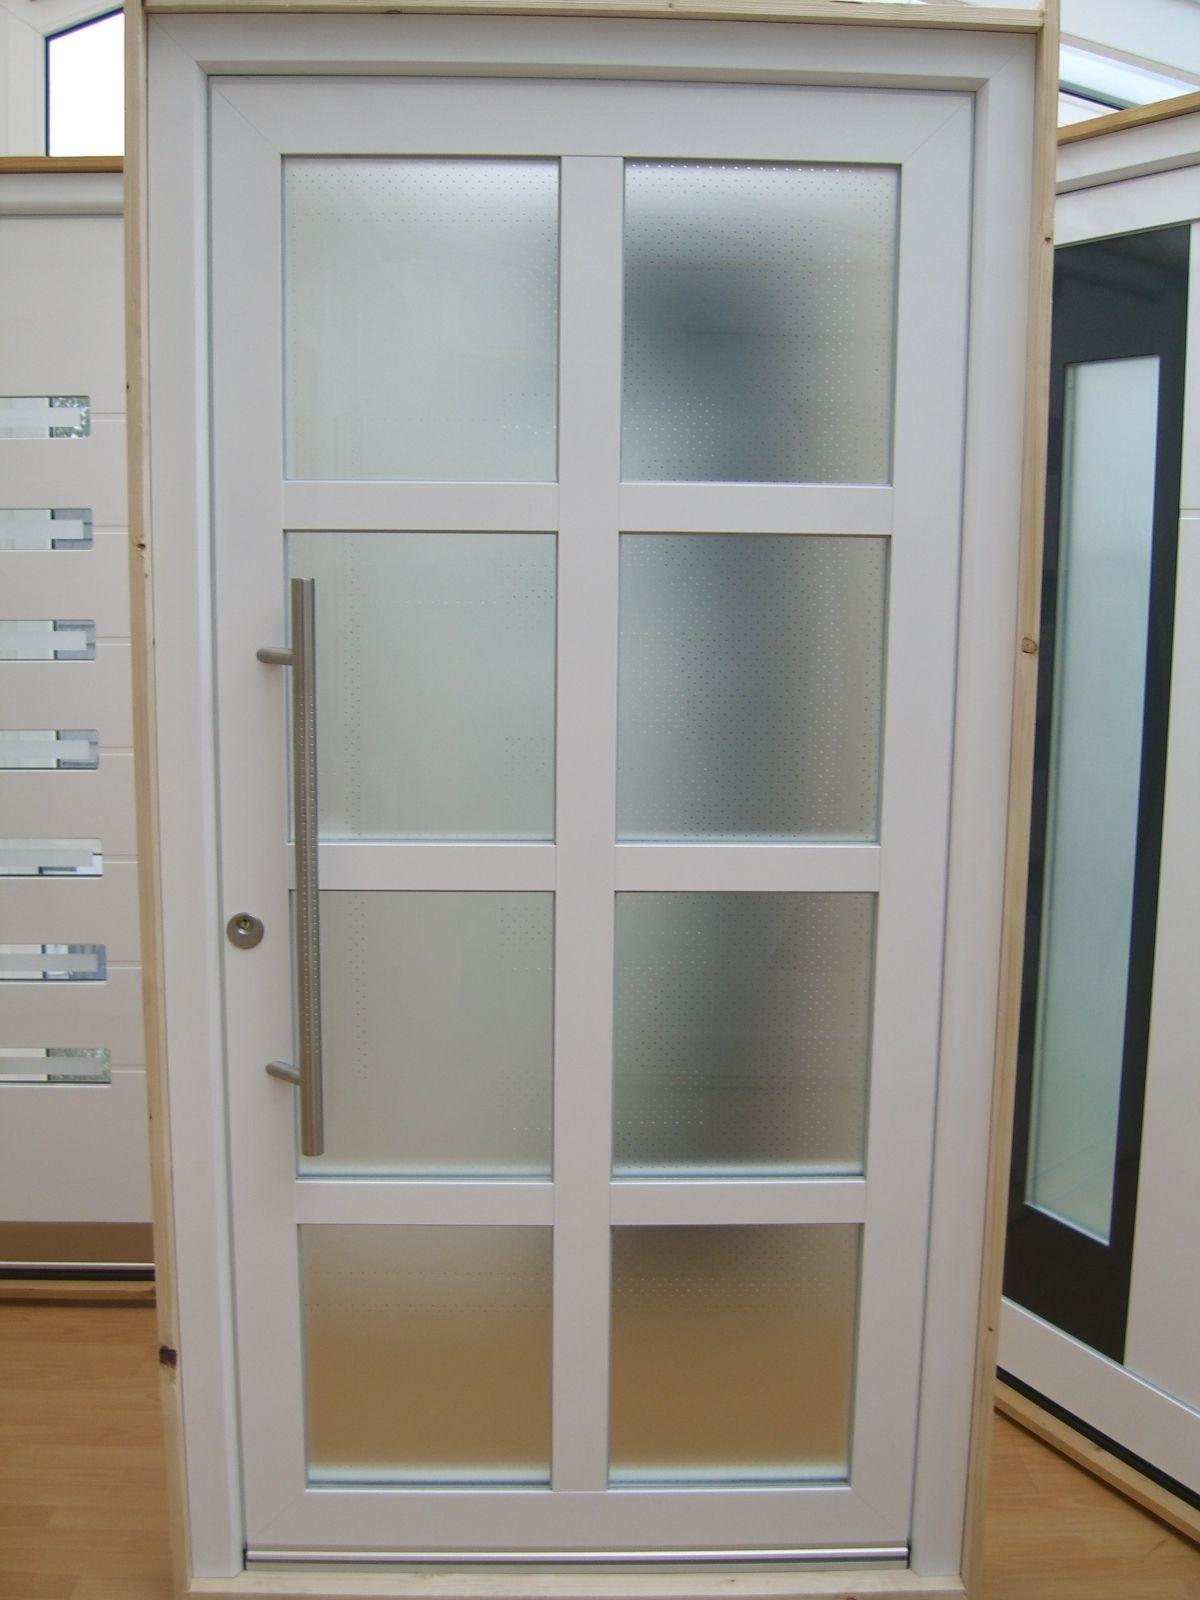 Hausture Aluminium Glas 3 Fach Veglasung Sprossen Schuco Profile Neu Ebay Haus Haustur Sprossenfenster